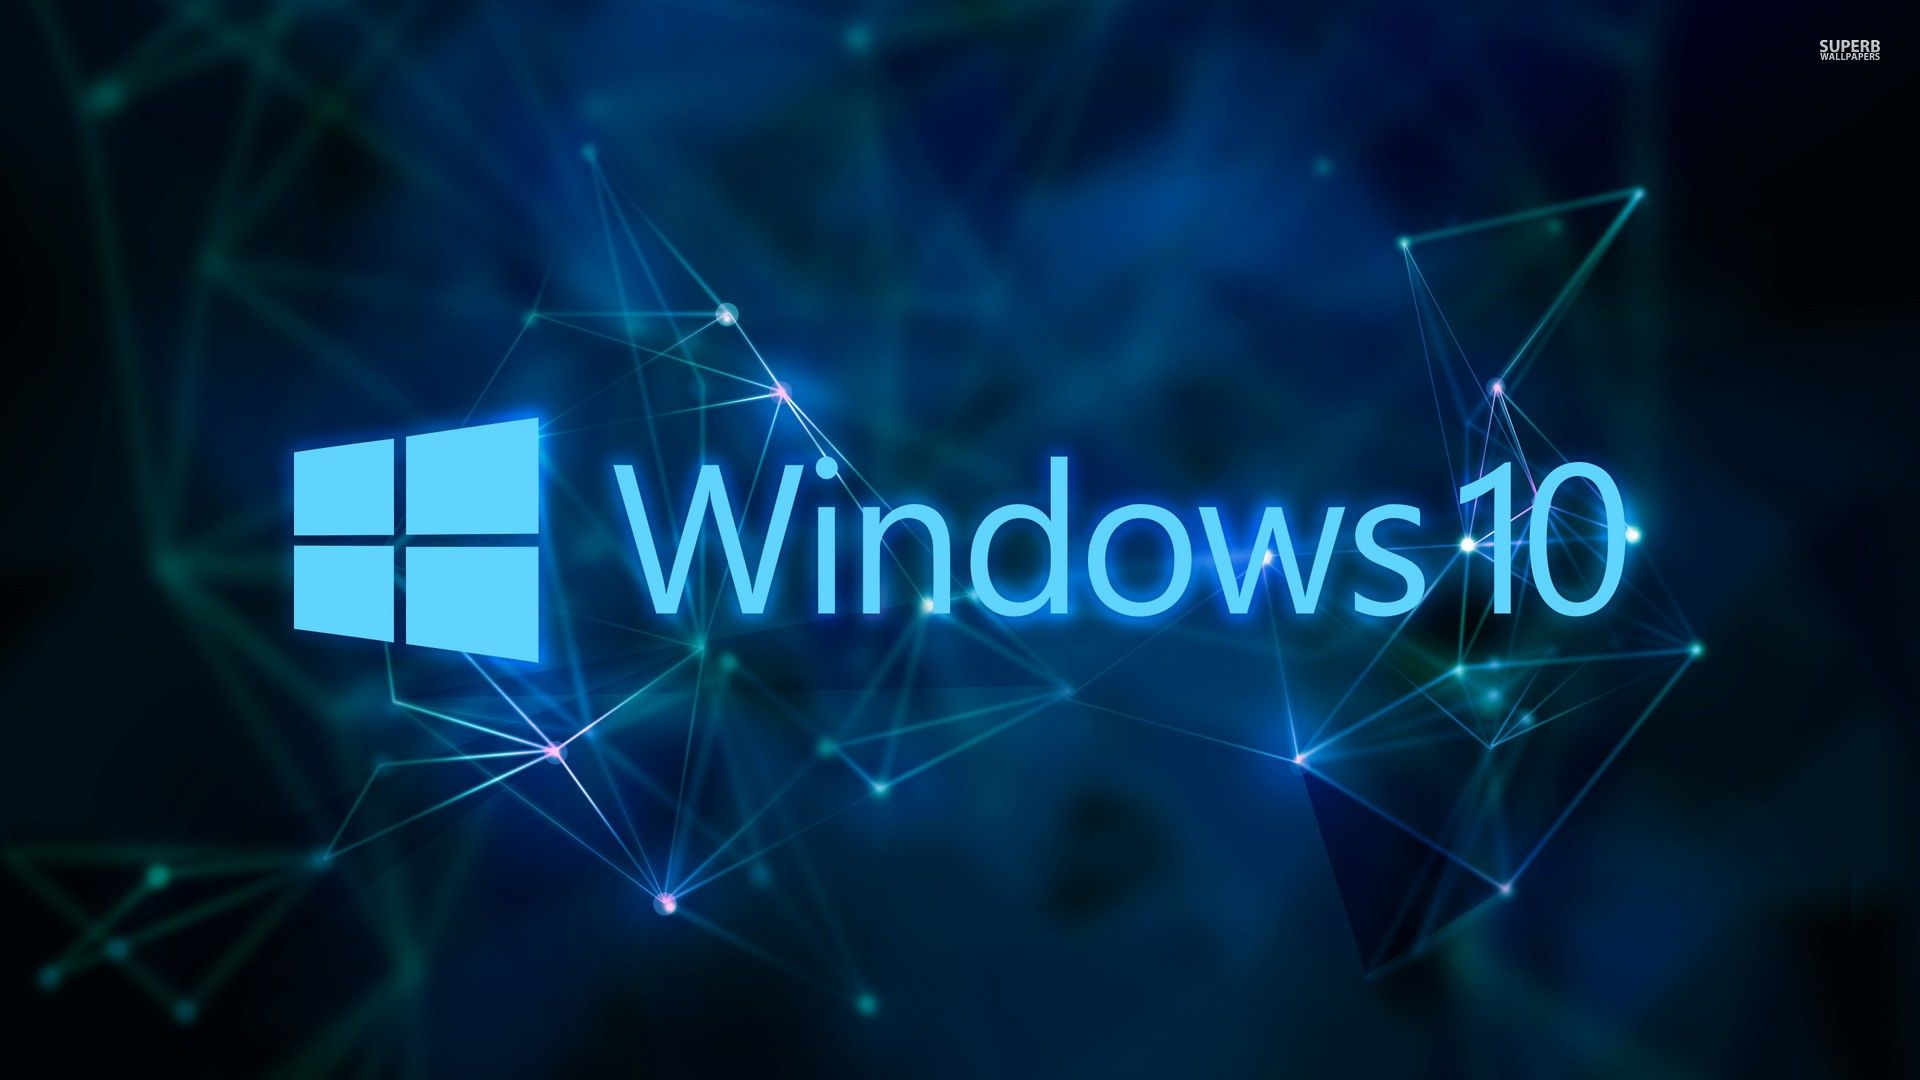 Best Windows 10 Wallpaper Hd 2020 Live Wallpaper Hd Windows 10 Wallpaper Windows 10 Best Windows